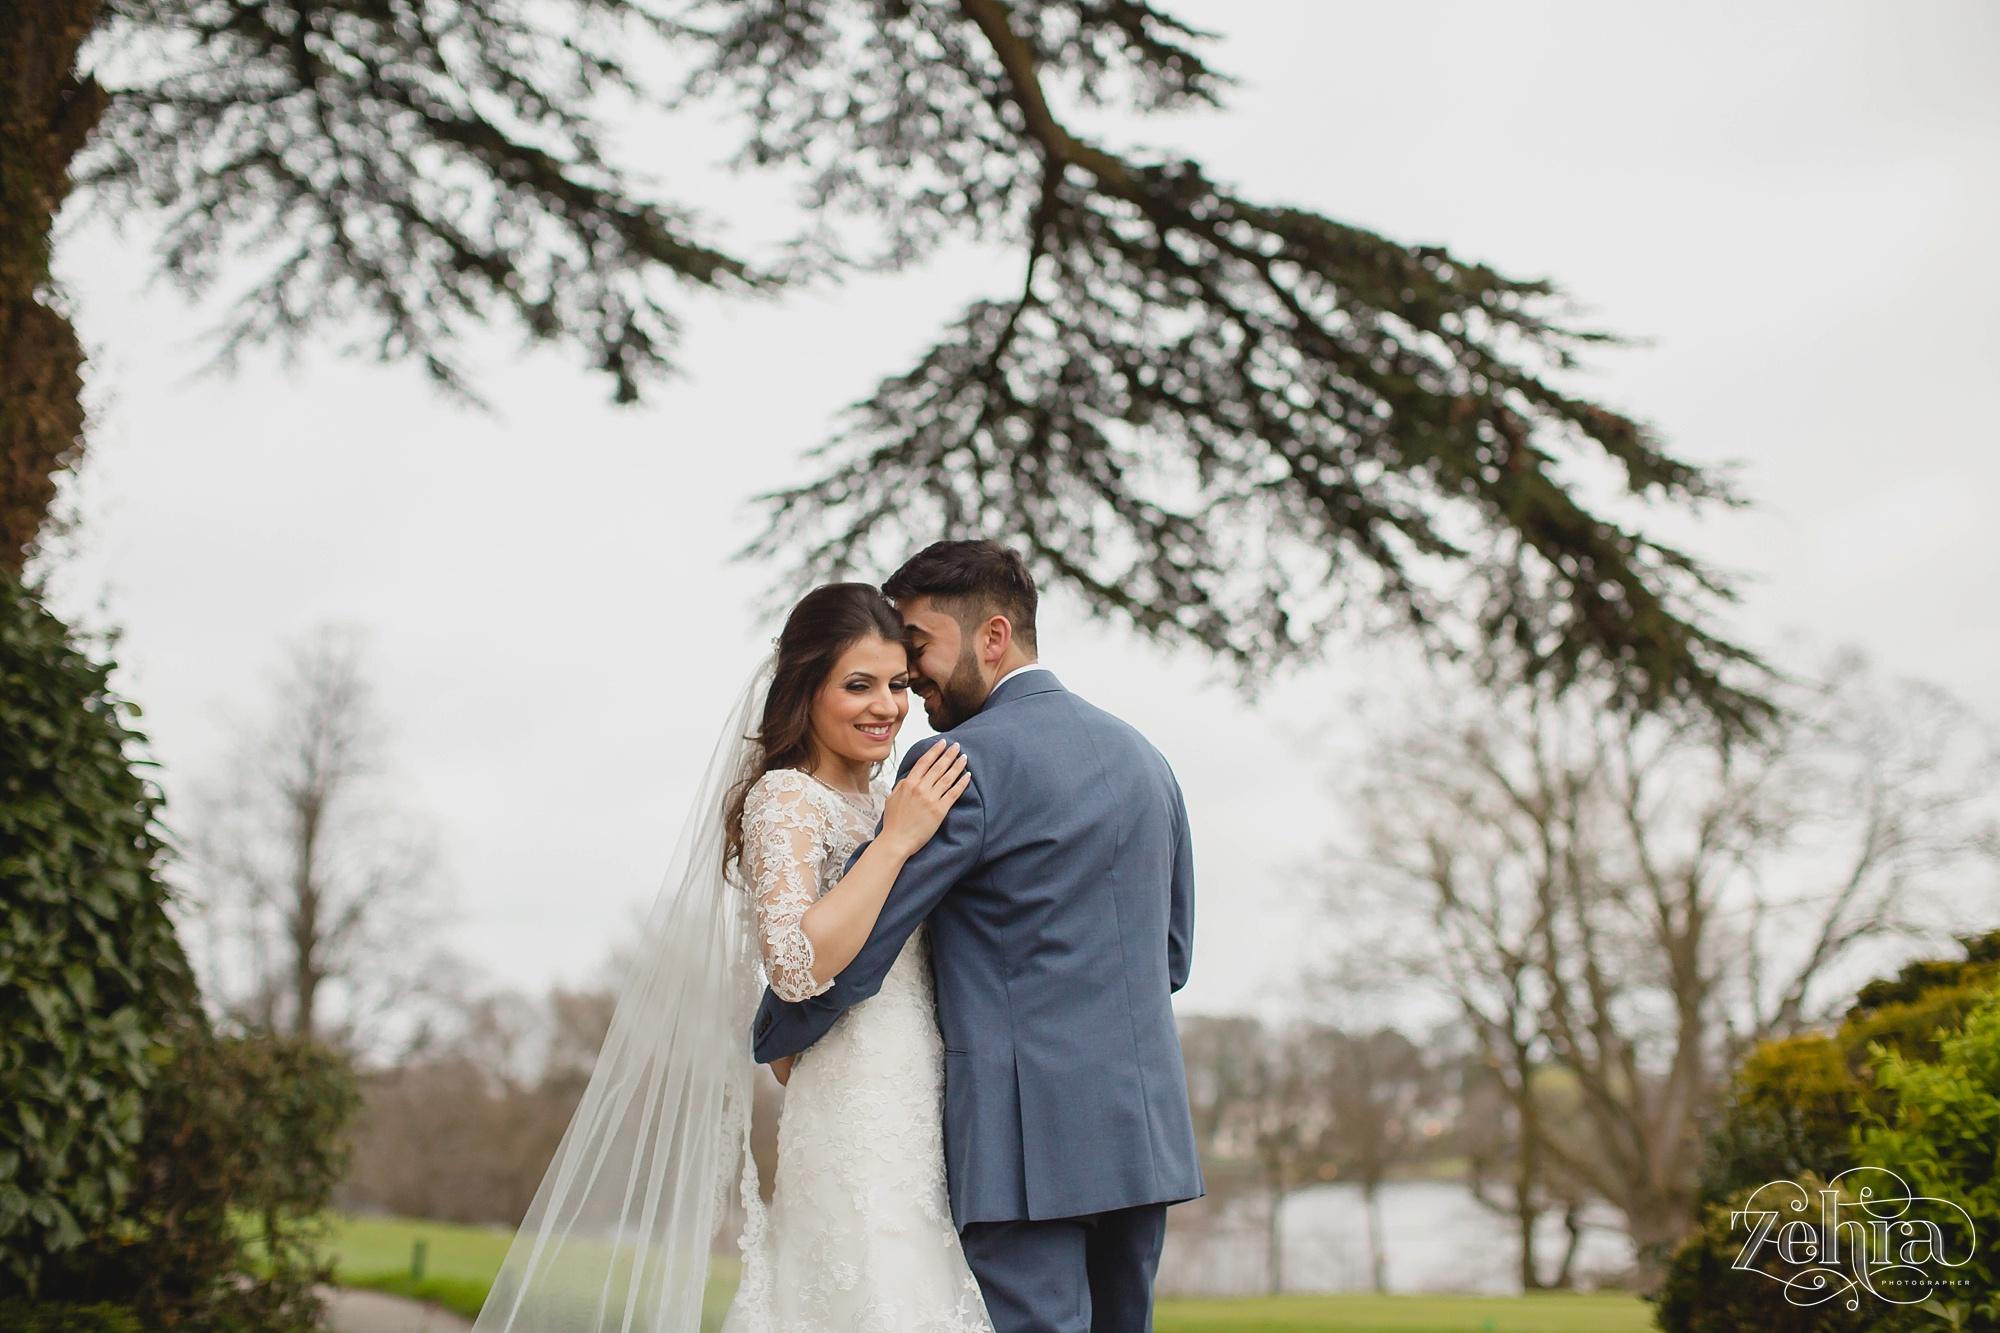 zehra photographer mere cheshire wedding_0048.jpg